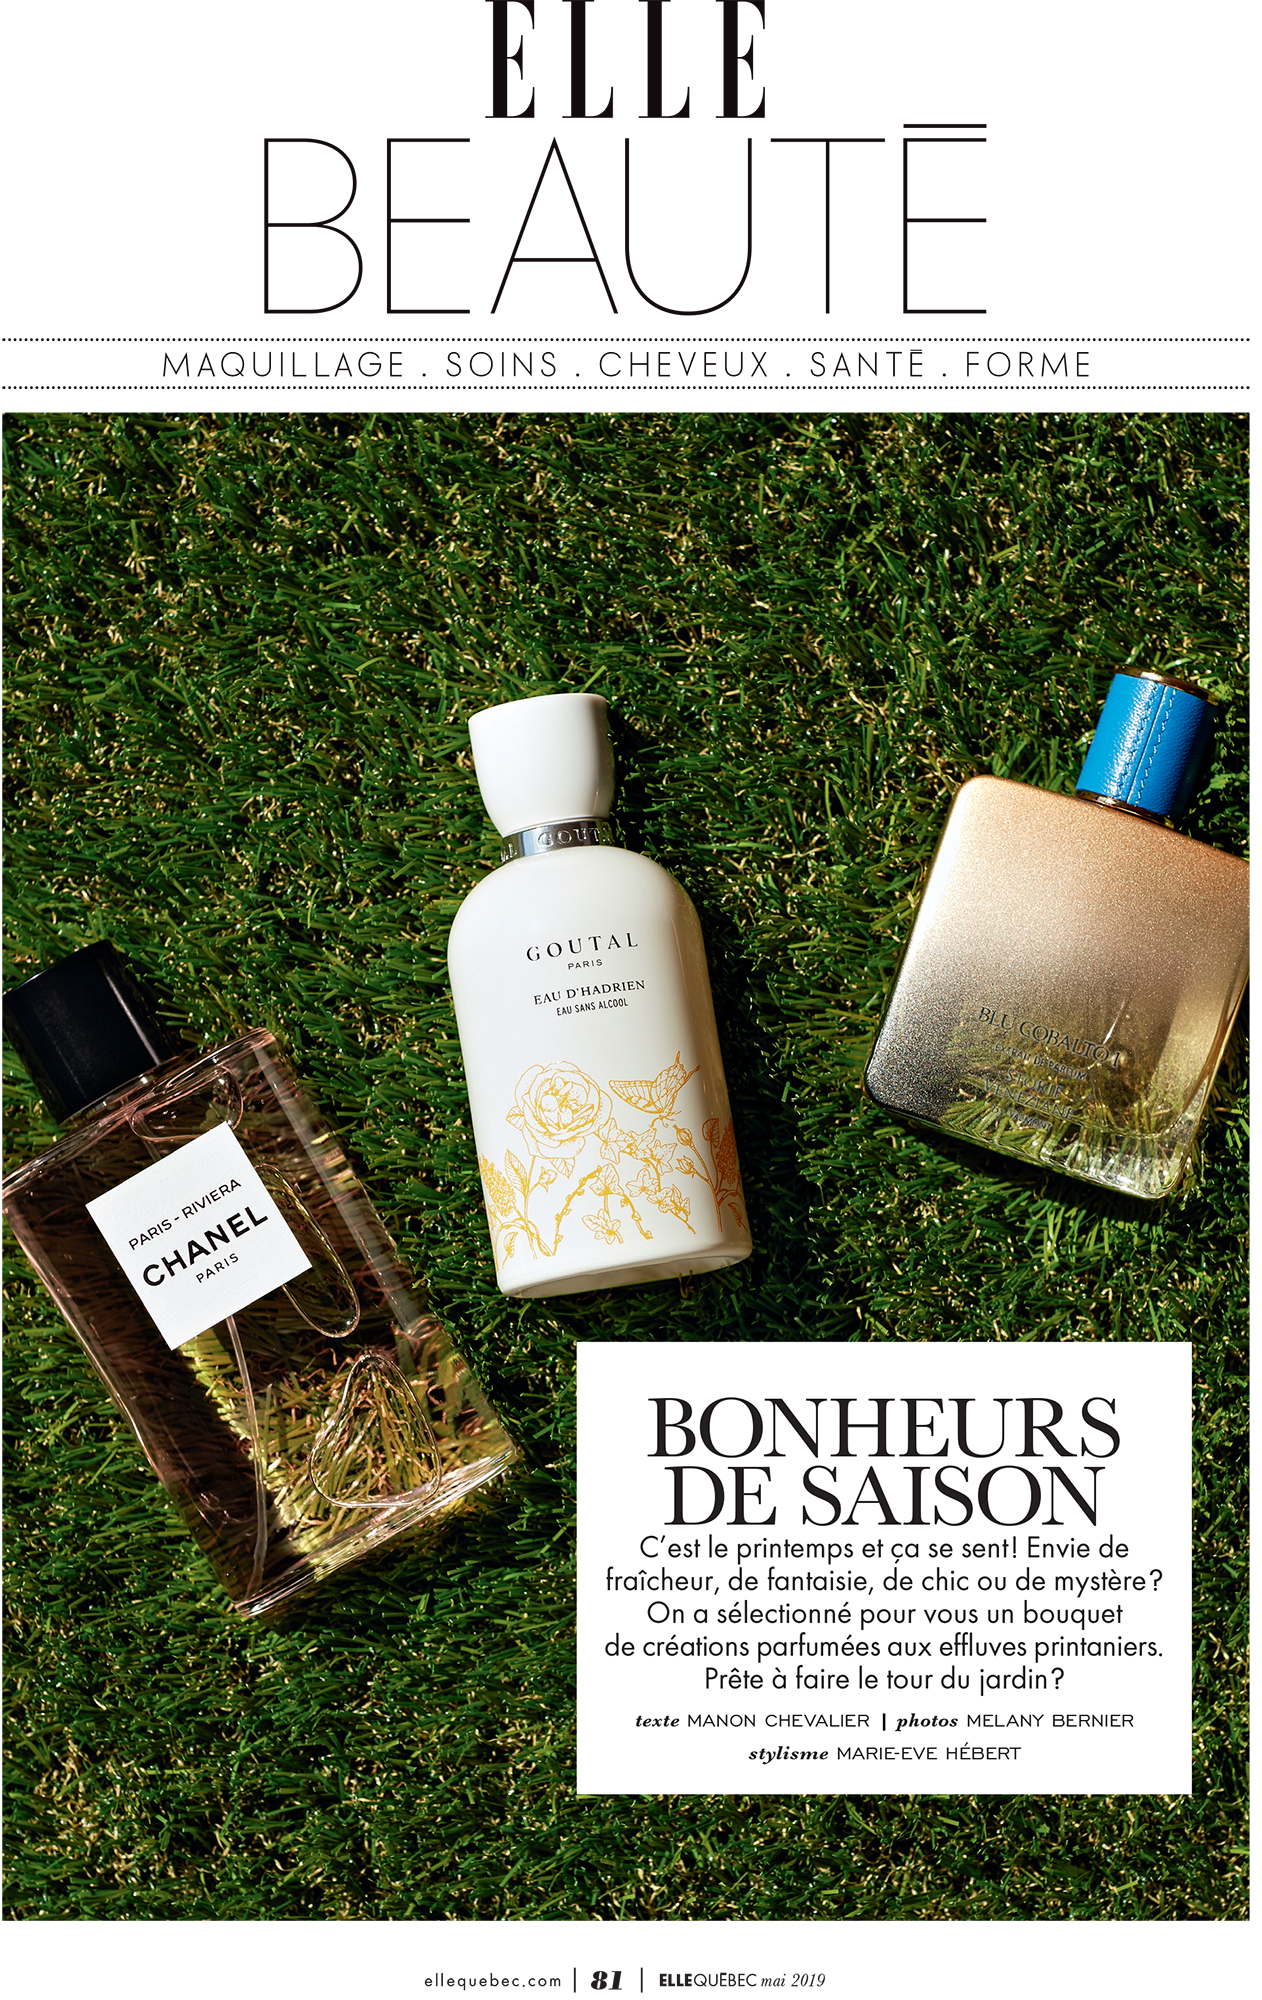 081_BPAR_EQ353_Parfums [IMP].indd